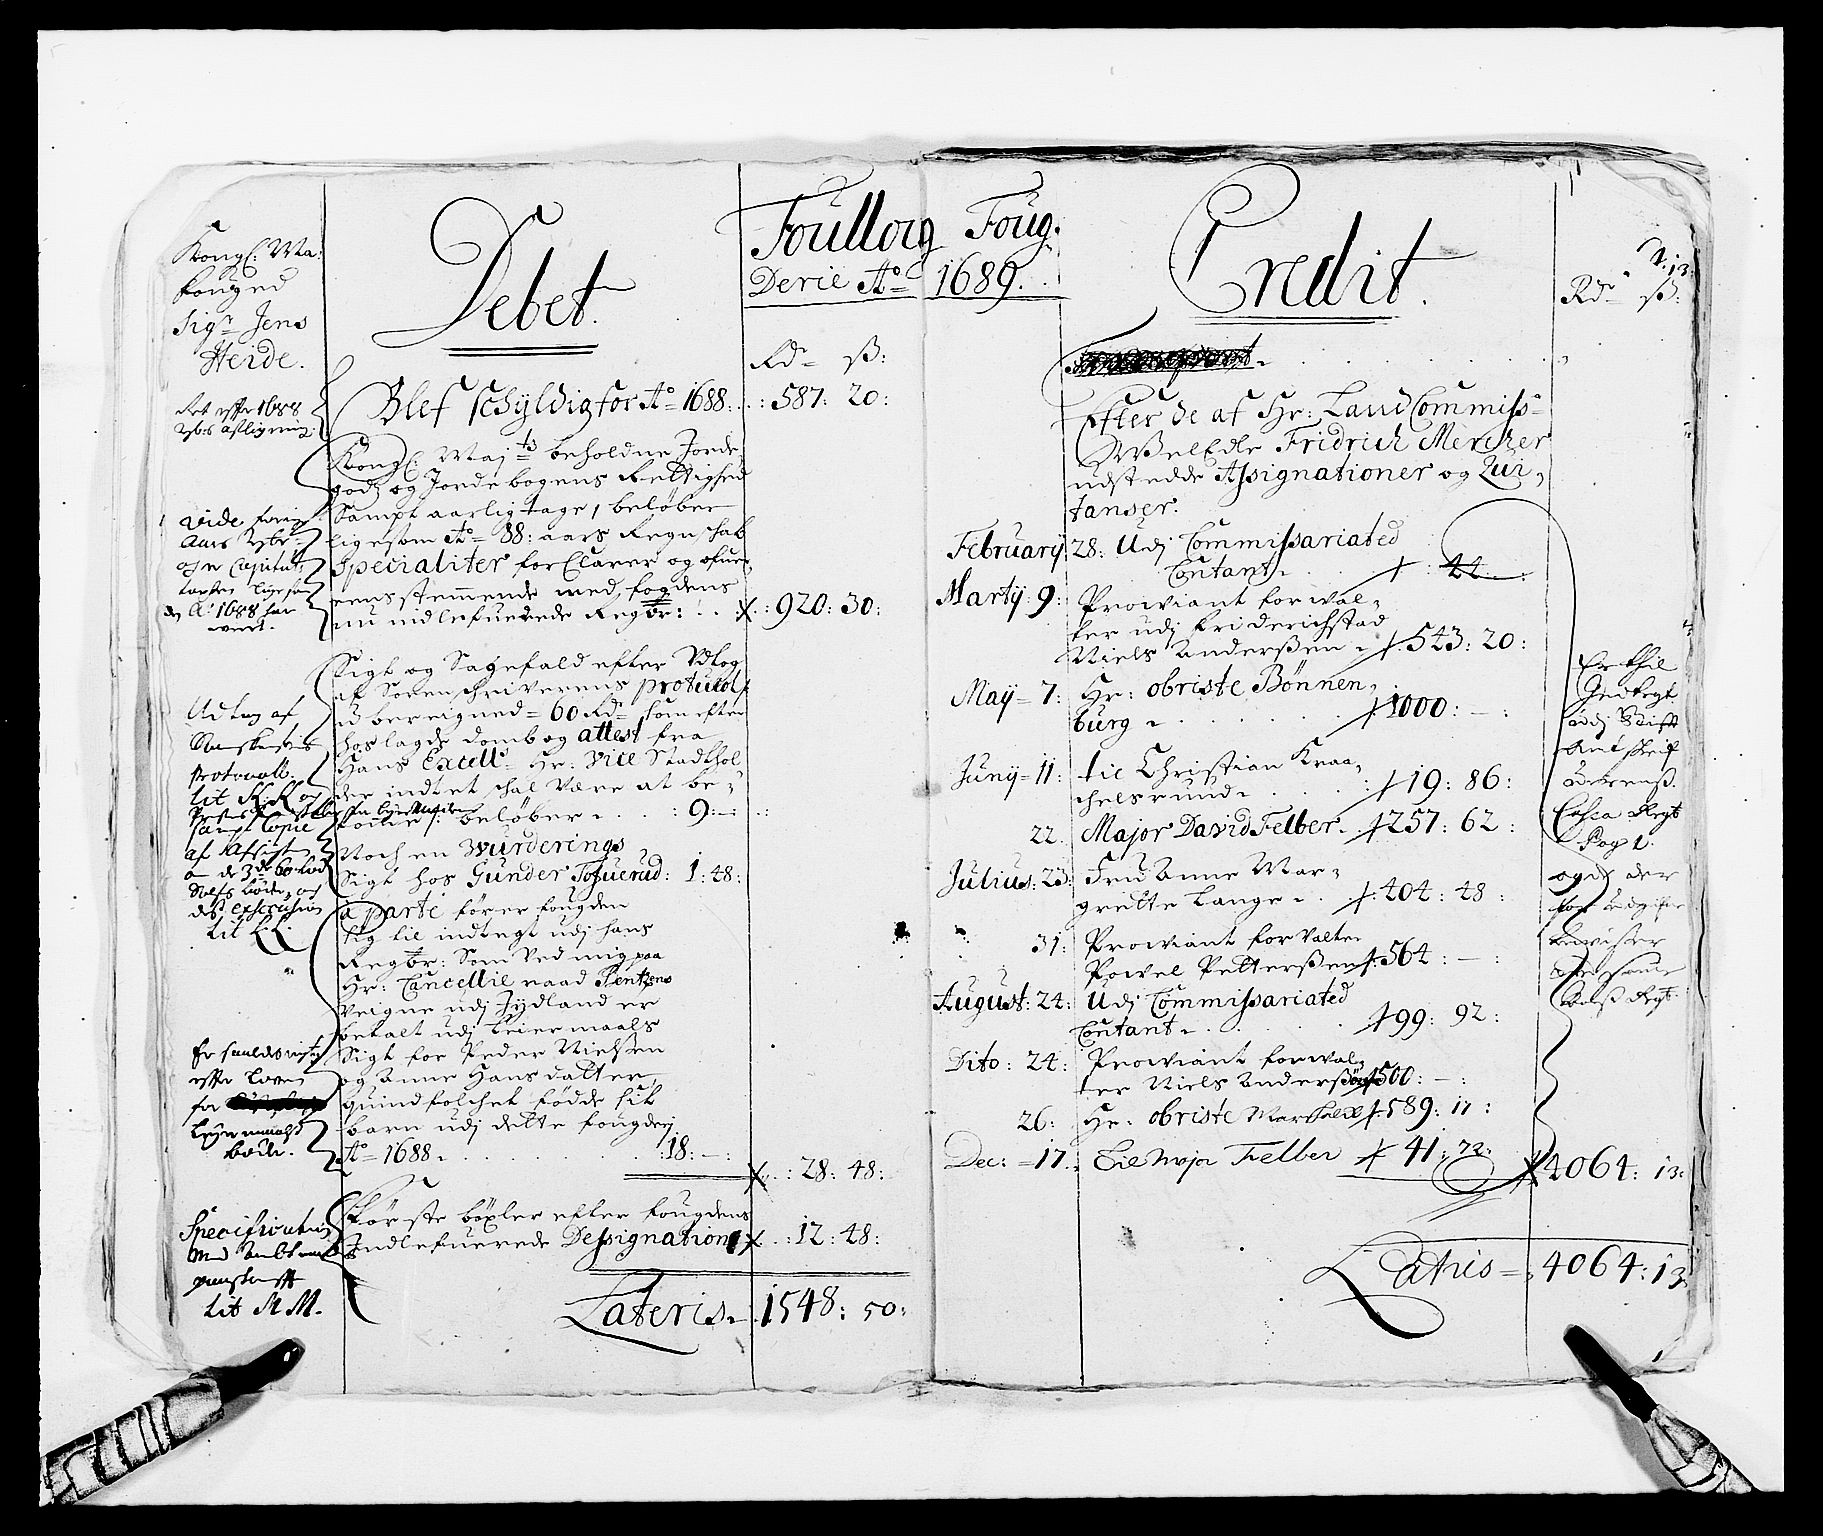 RA, Rentekammeret inntil 1814, Reviderte regnskaper, Fogderegnskap, R09/L0436: Fogderegnskap Follo, 1685-1691, s. 21